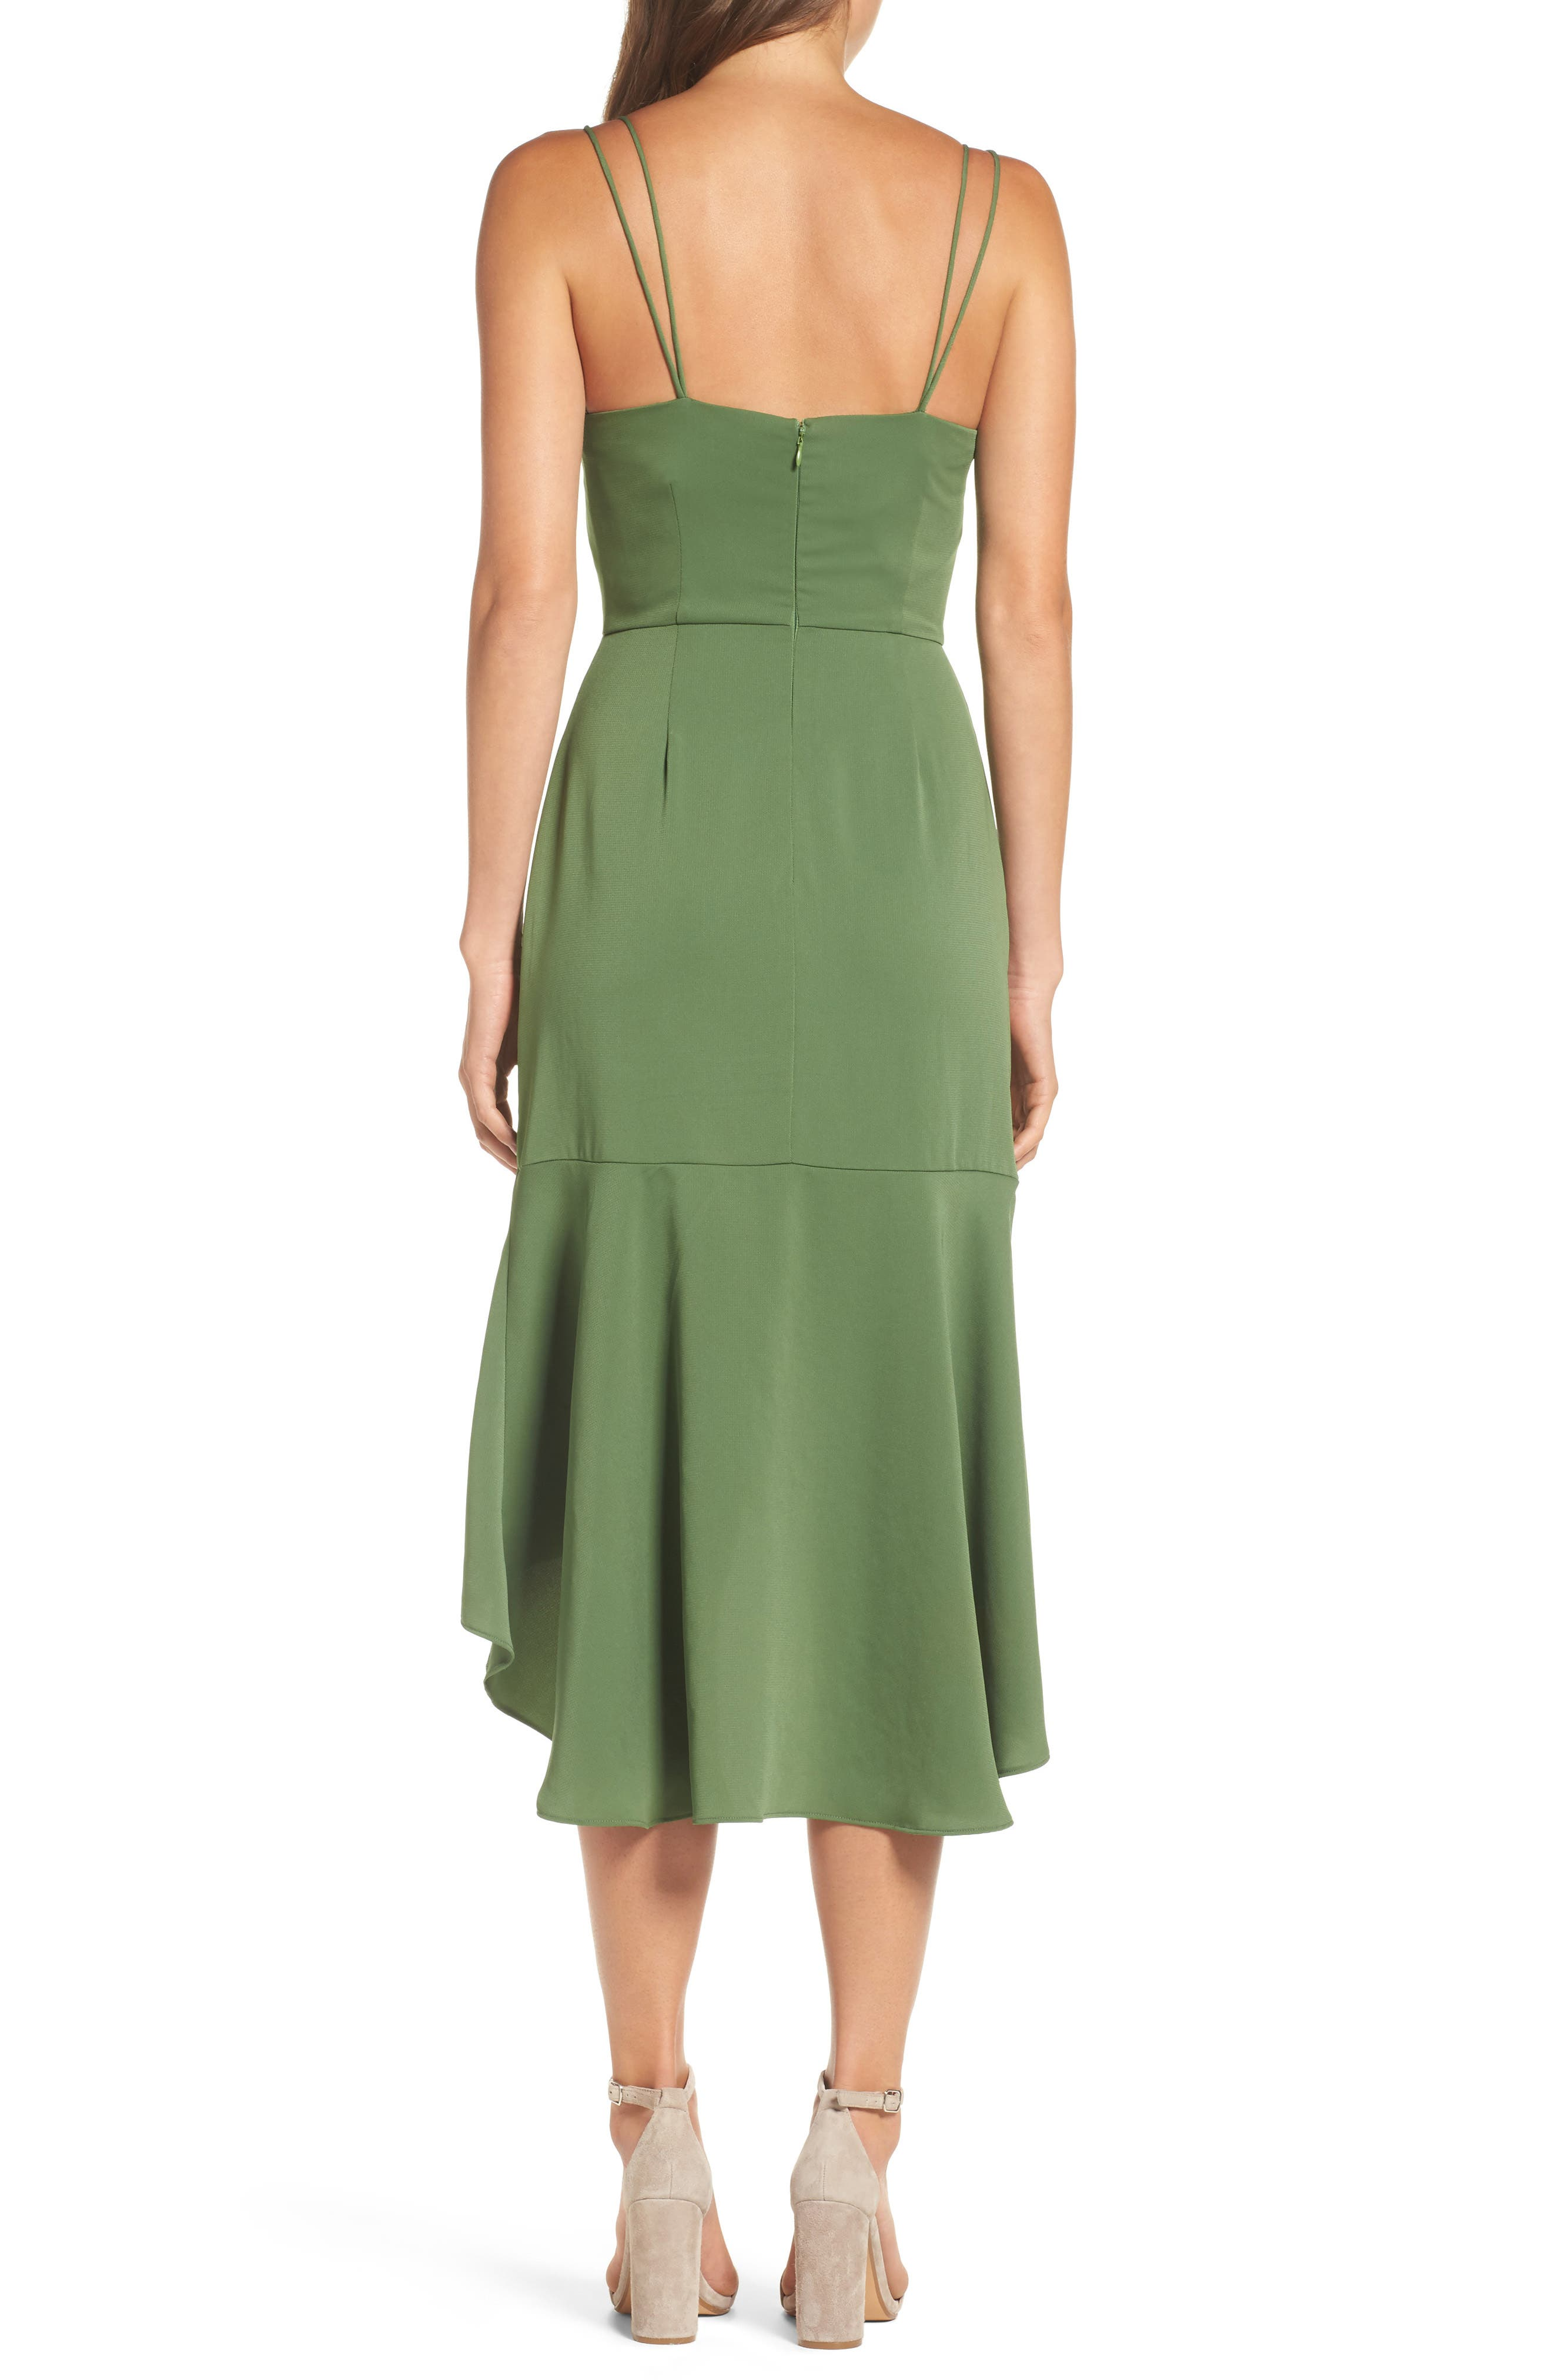 Lovine Midi Dress,                             Alternate thumbnail 2, color,                             Moss Green